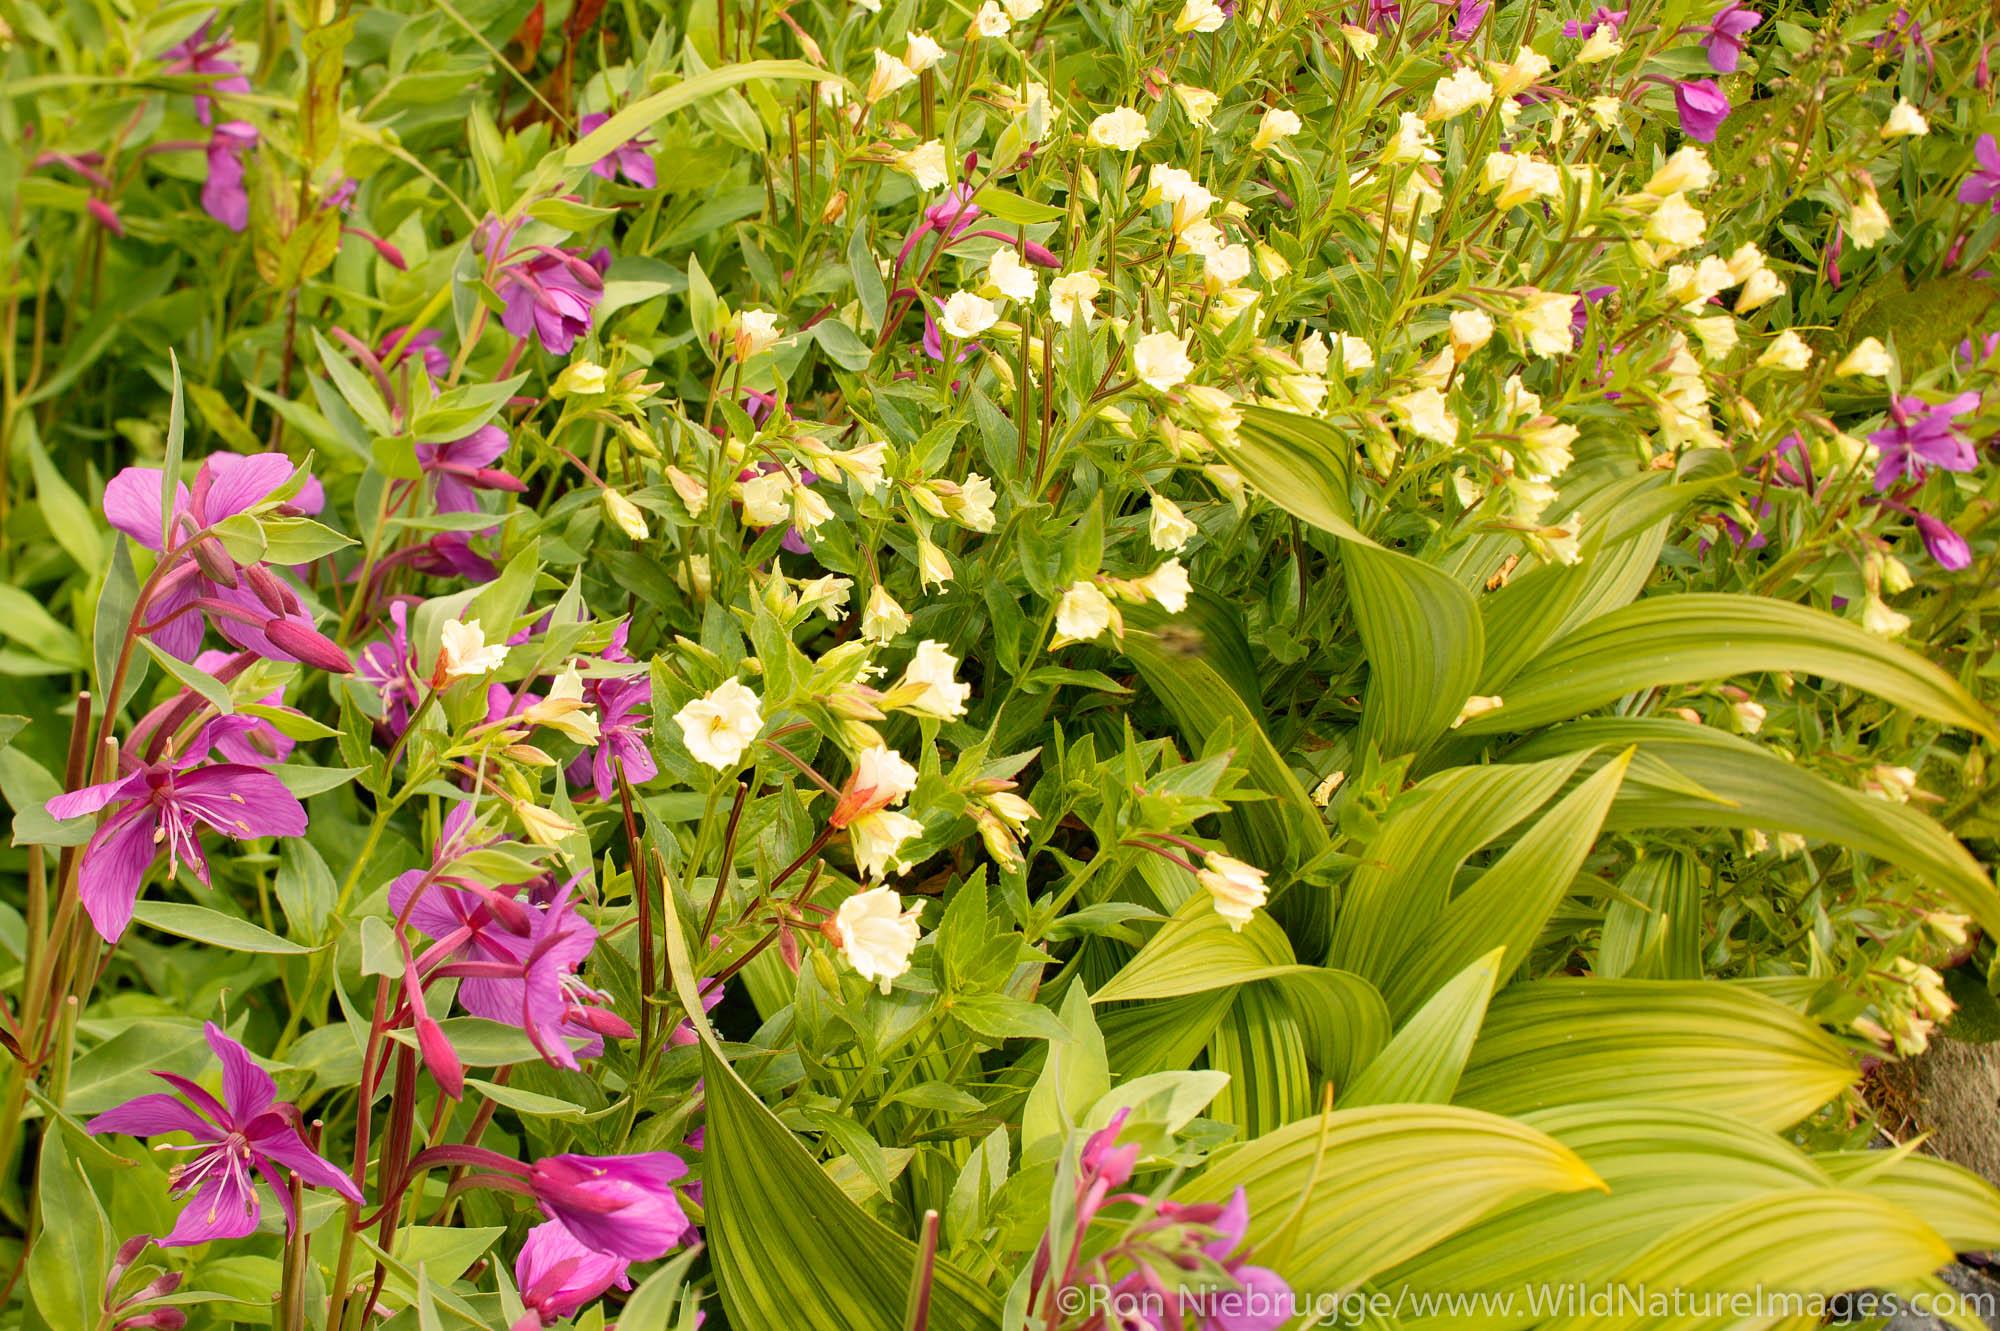 Wildflowers along the Harding Icefield trail, Kenai Fjords National Park, near Seward, Alaska.